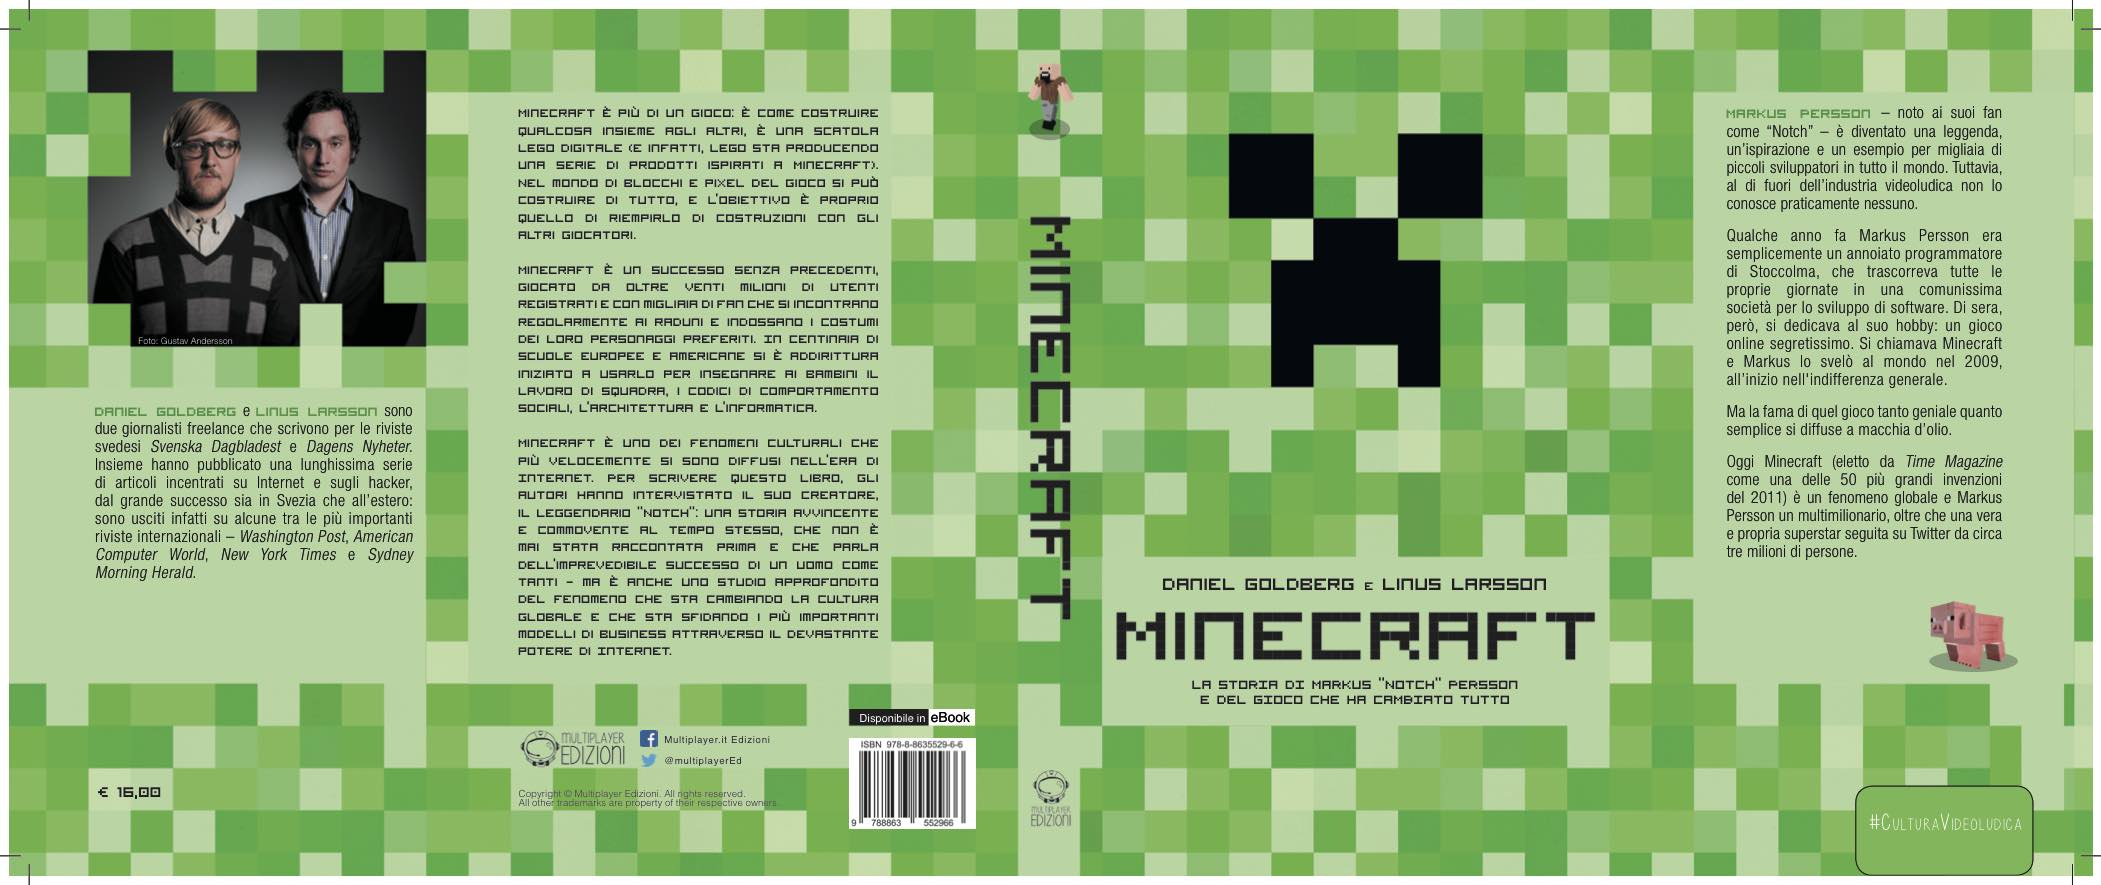 Minecraft-Copertina